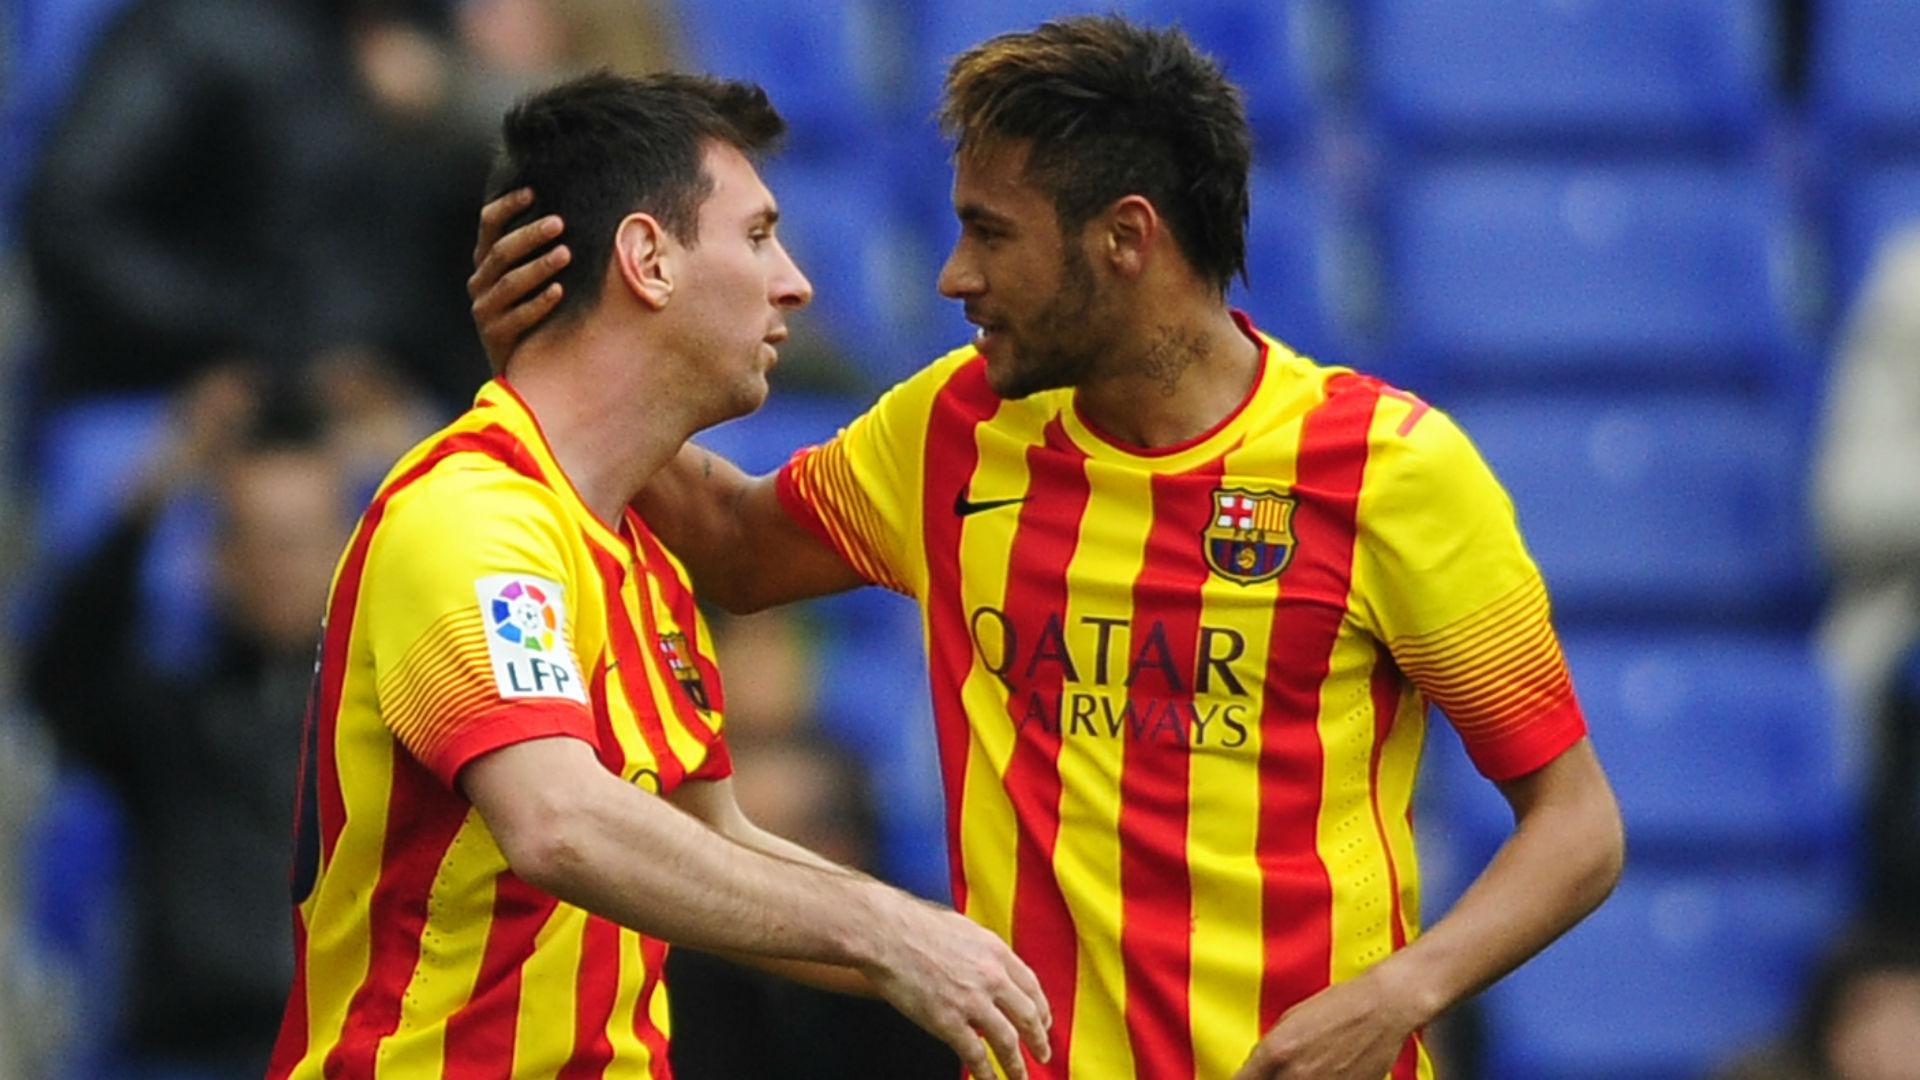 Neymar-Messi-071114-AP-FTR.jpg